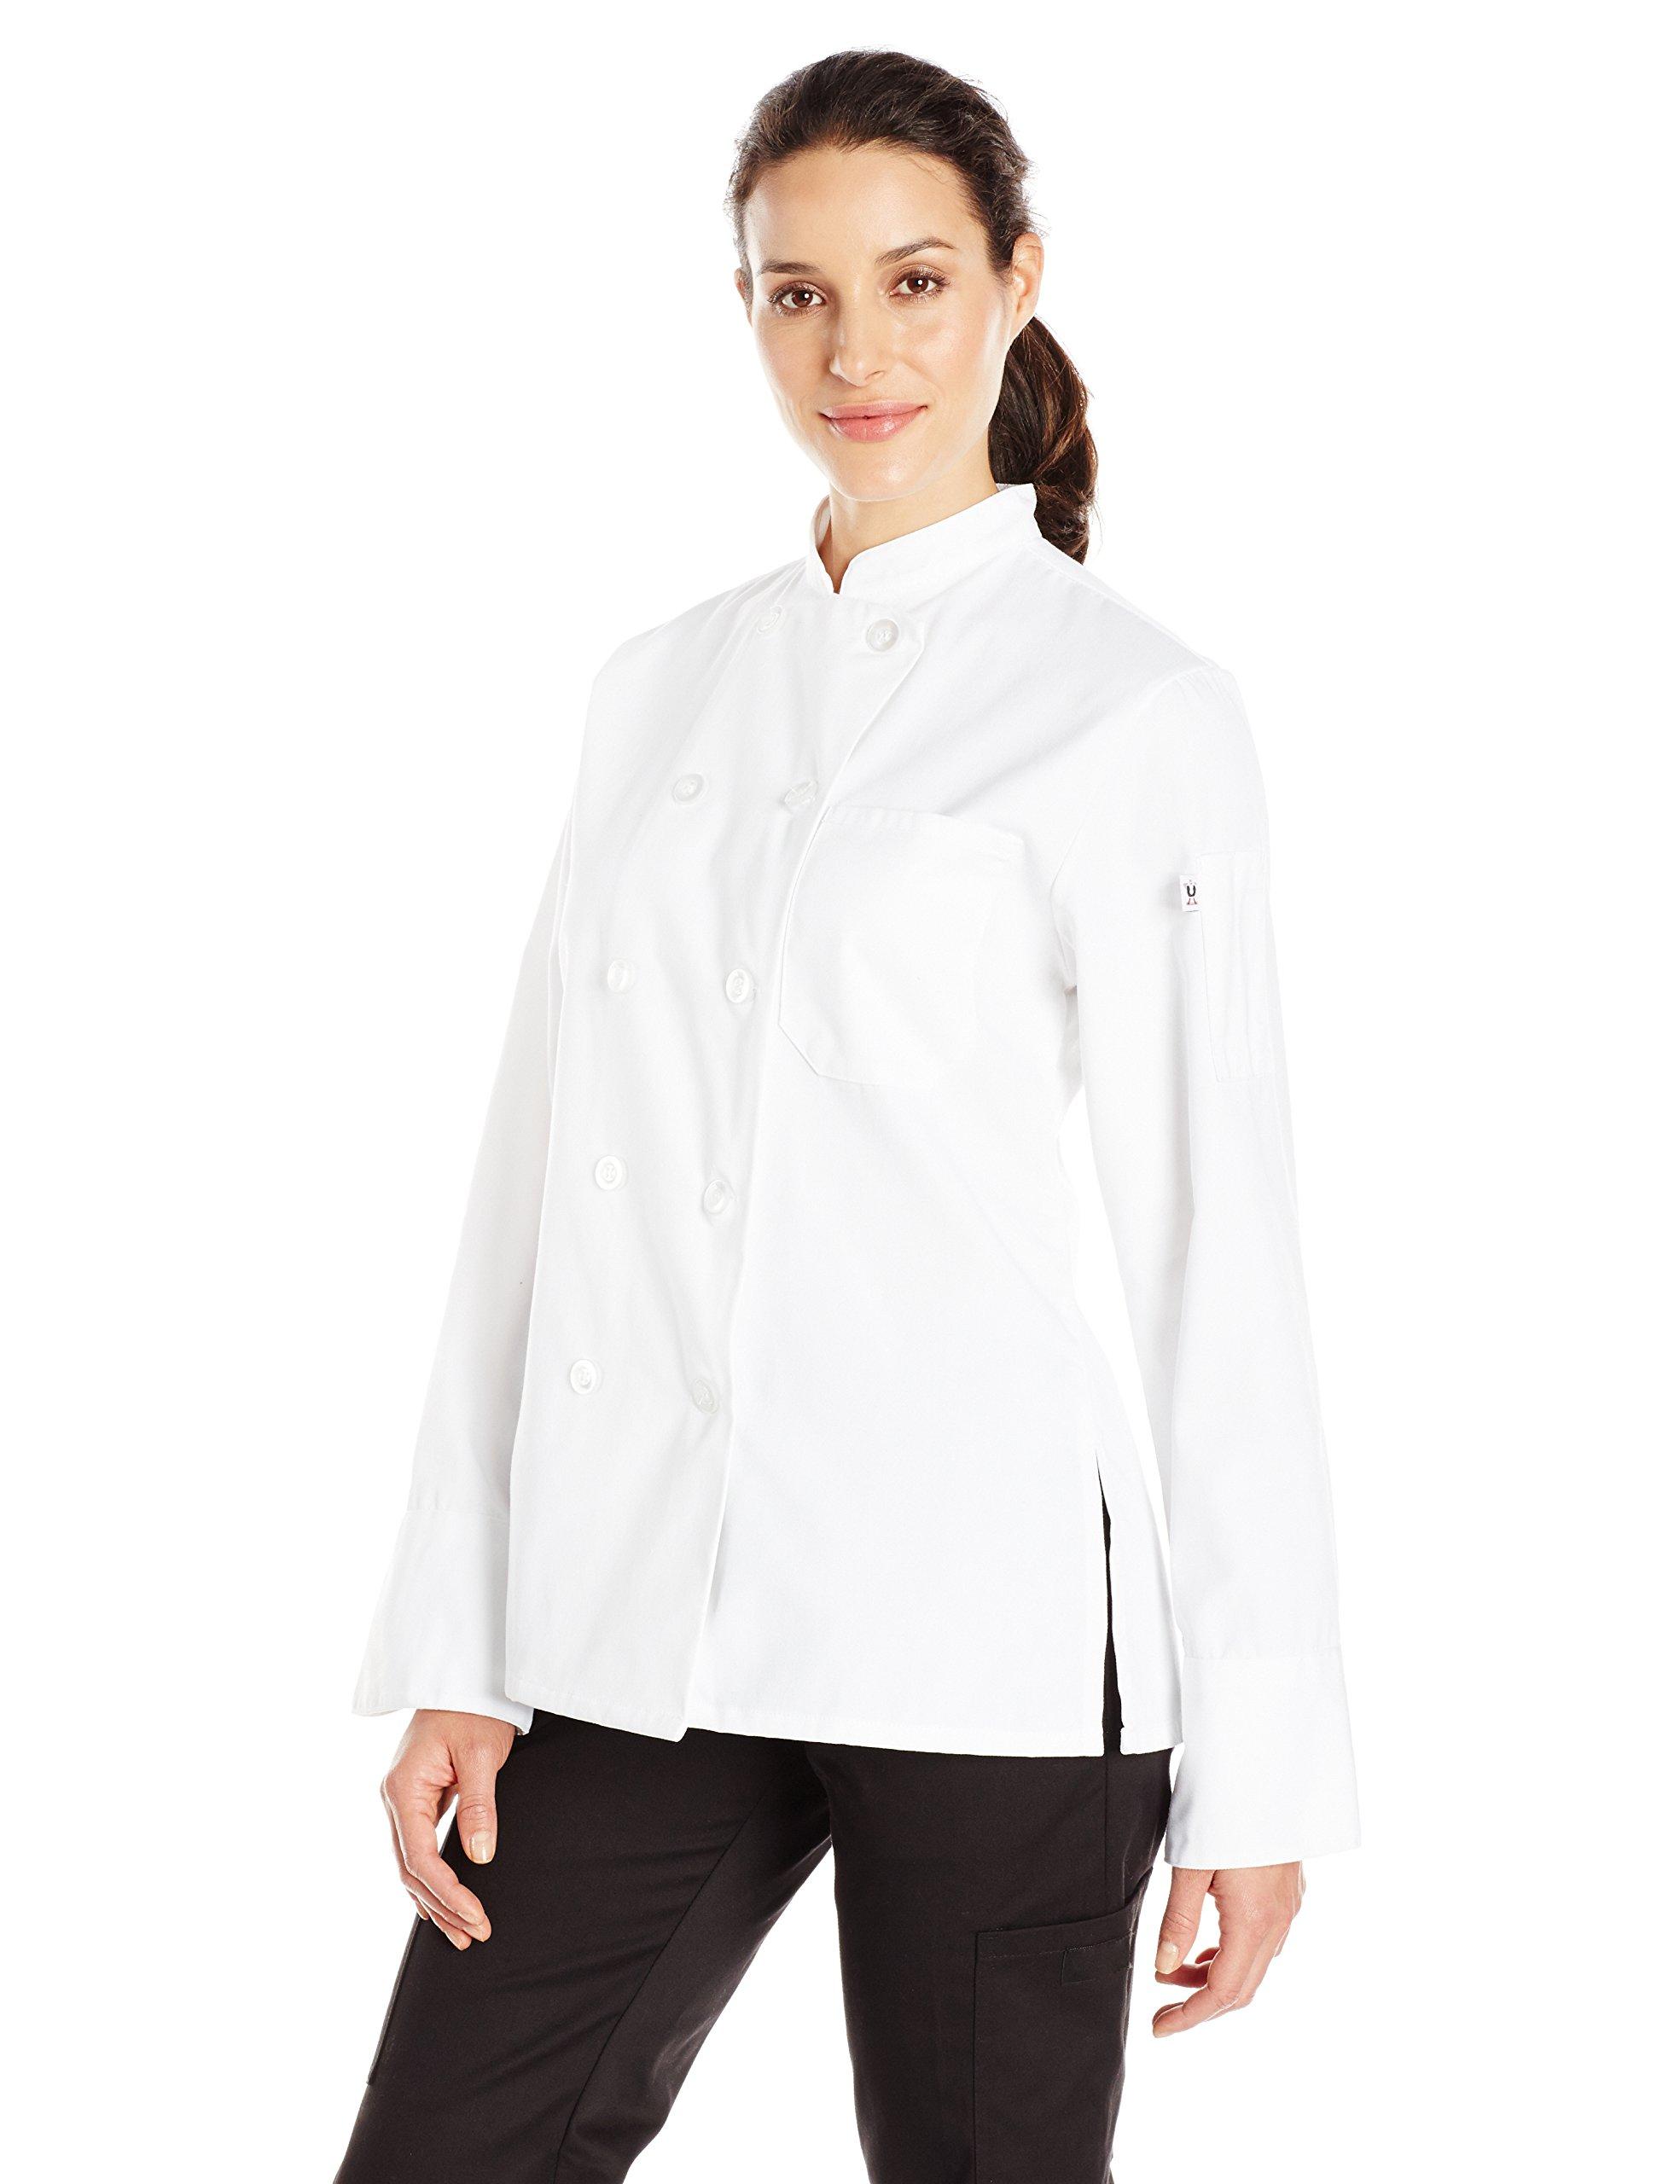 Uncommon Threads Women's Napa Fit Chef Coat, White, XX-Large